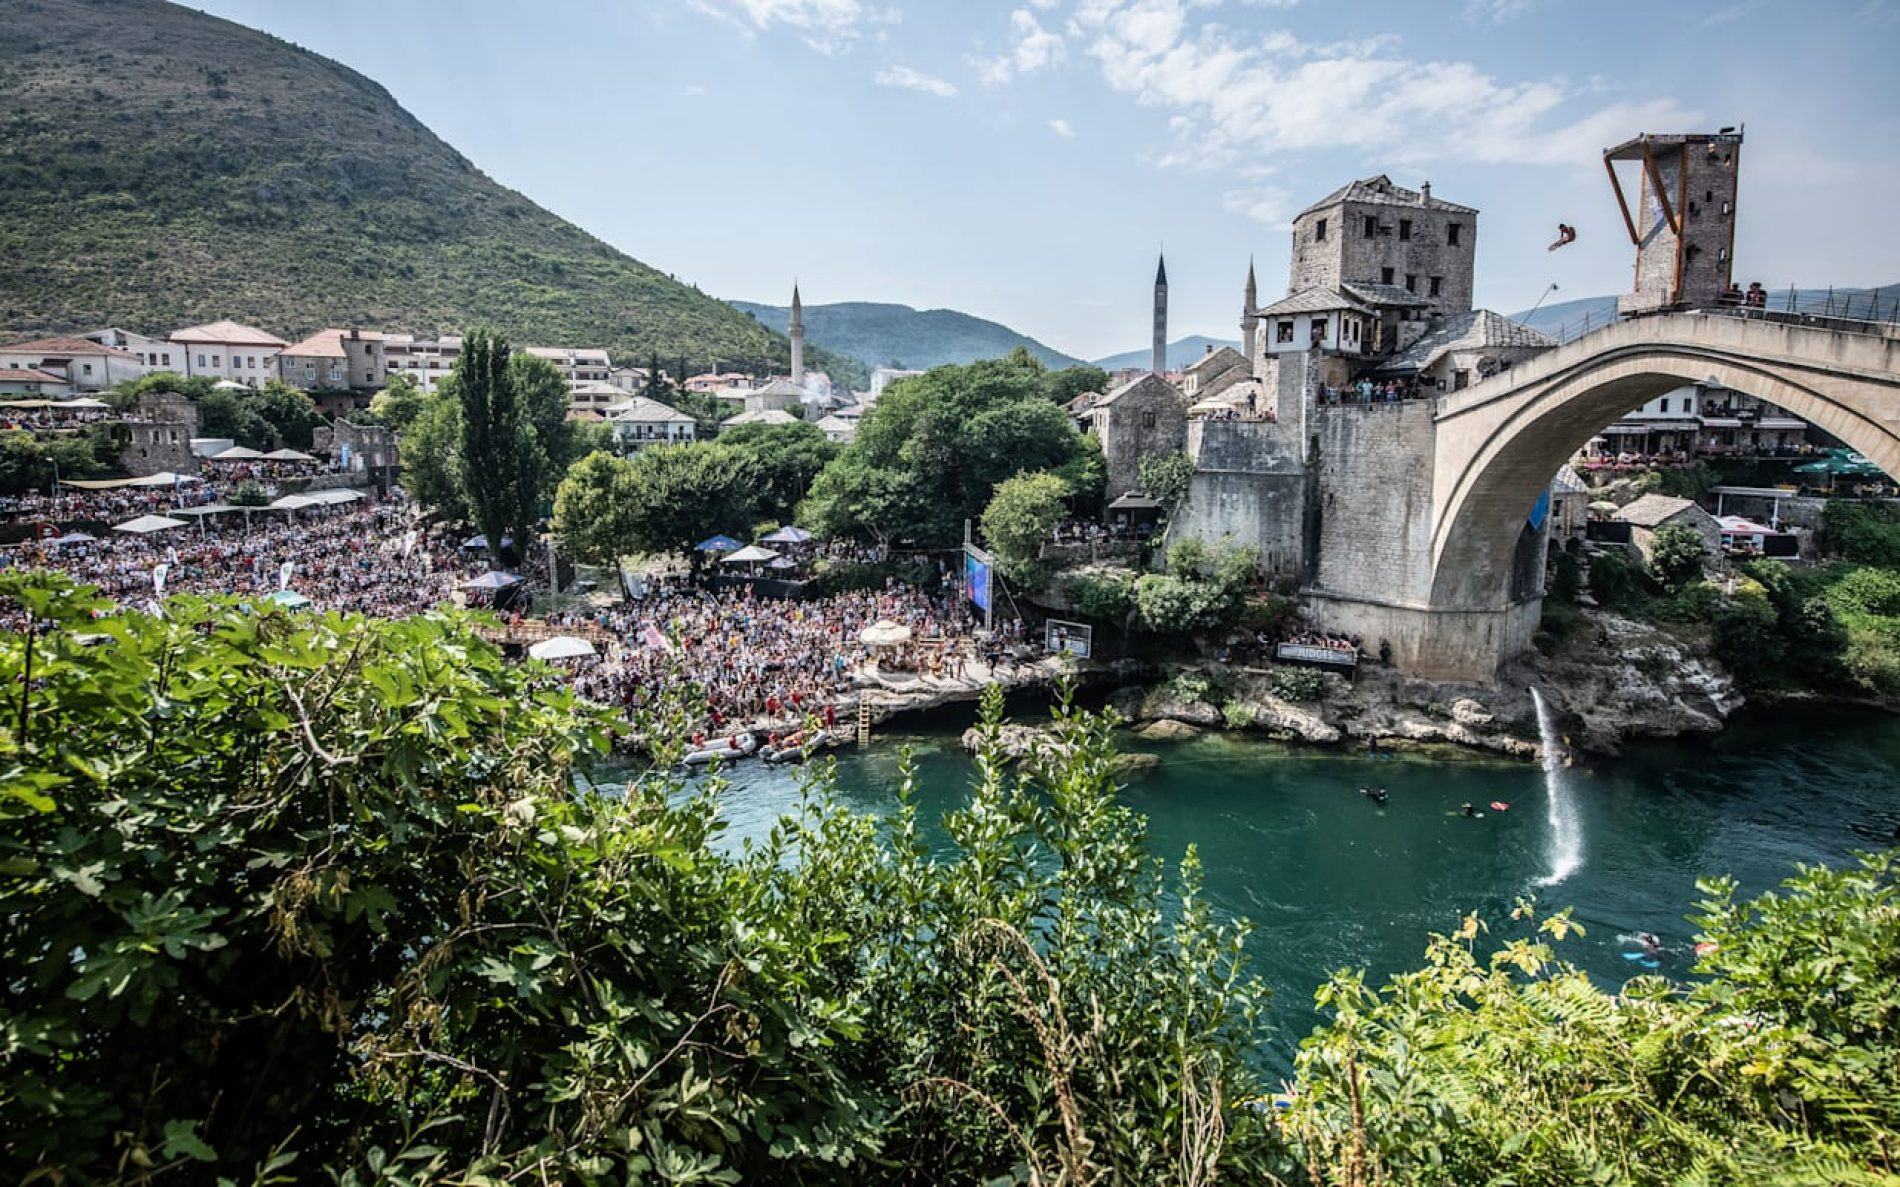 Red Bull Cliff Diving Svjetsko prvenstvo 28. augusta u Mostaru